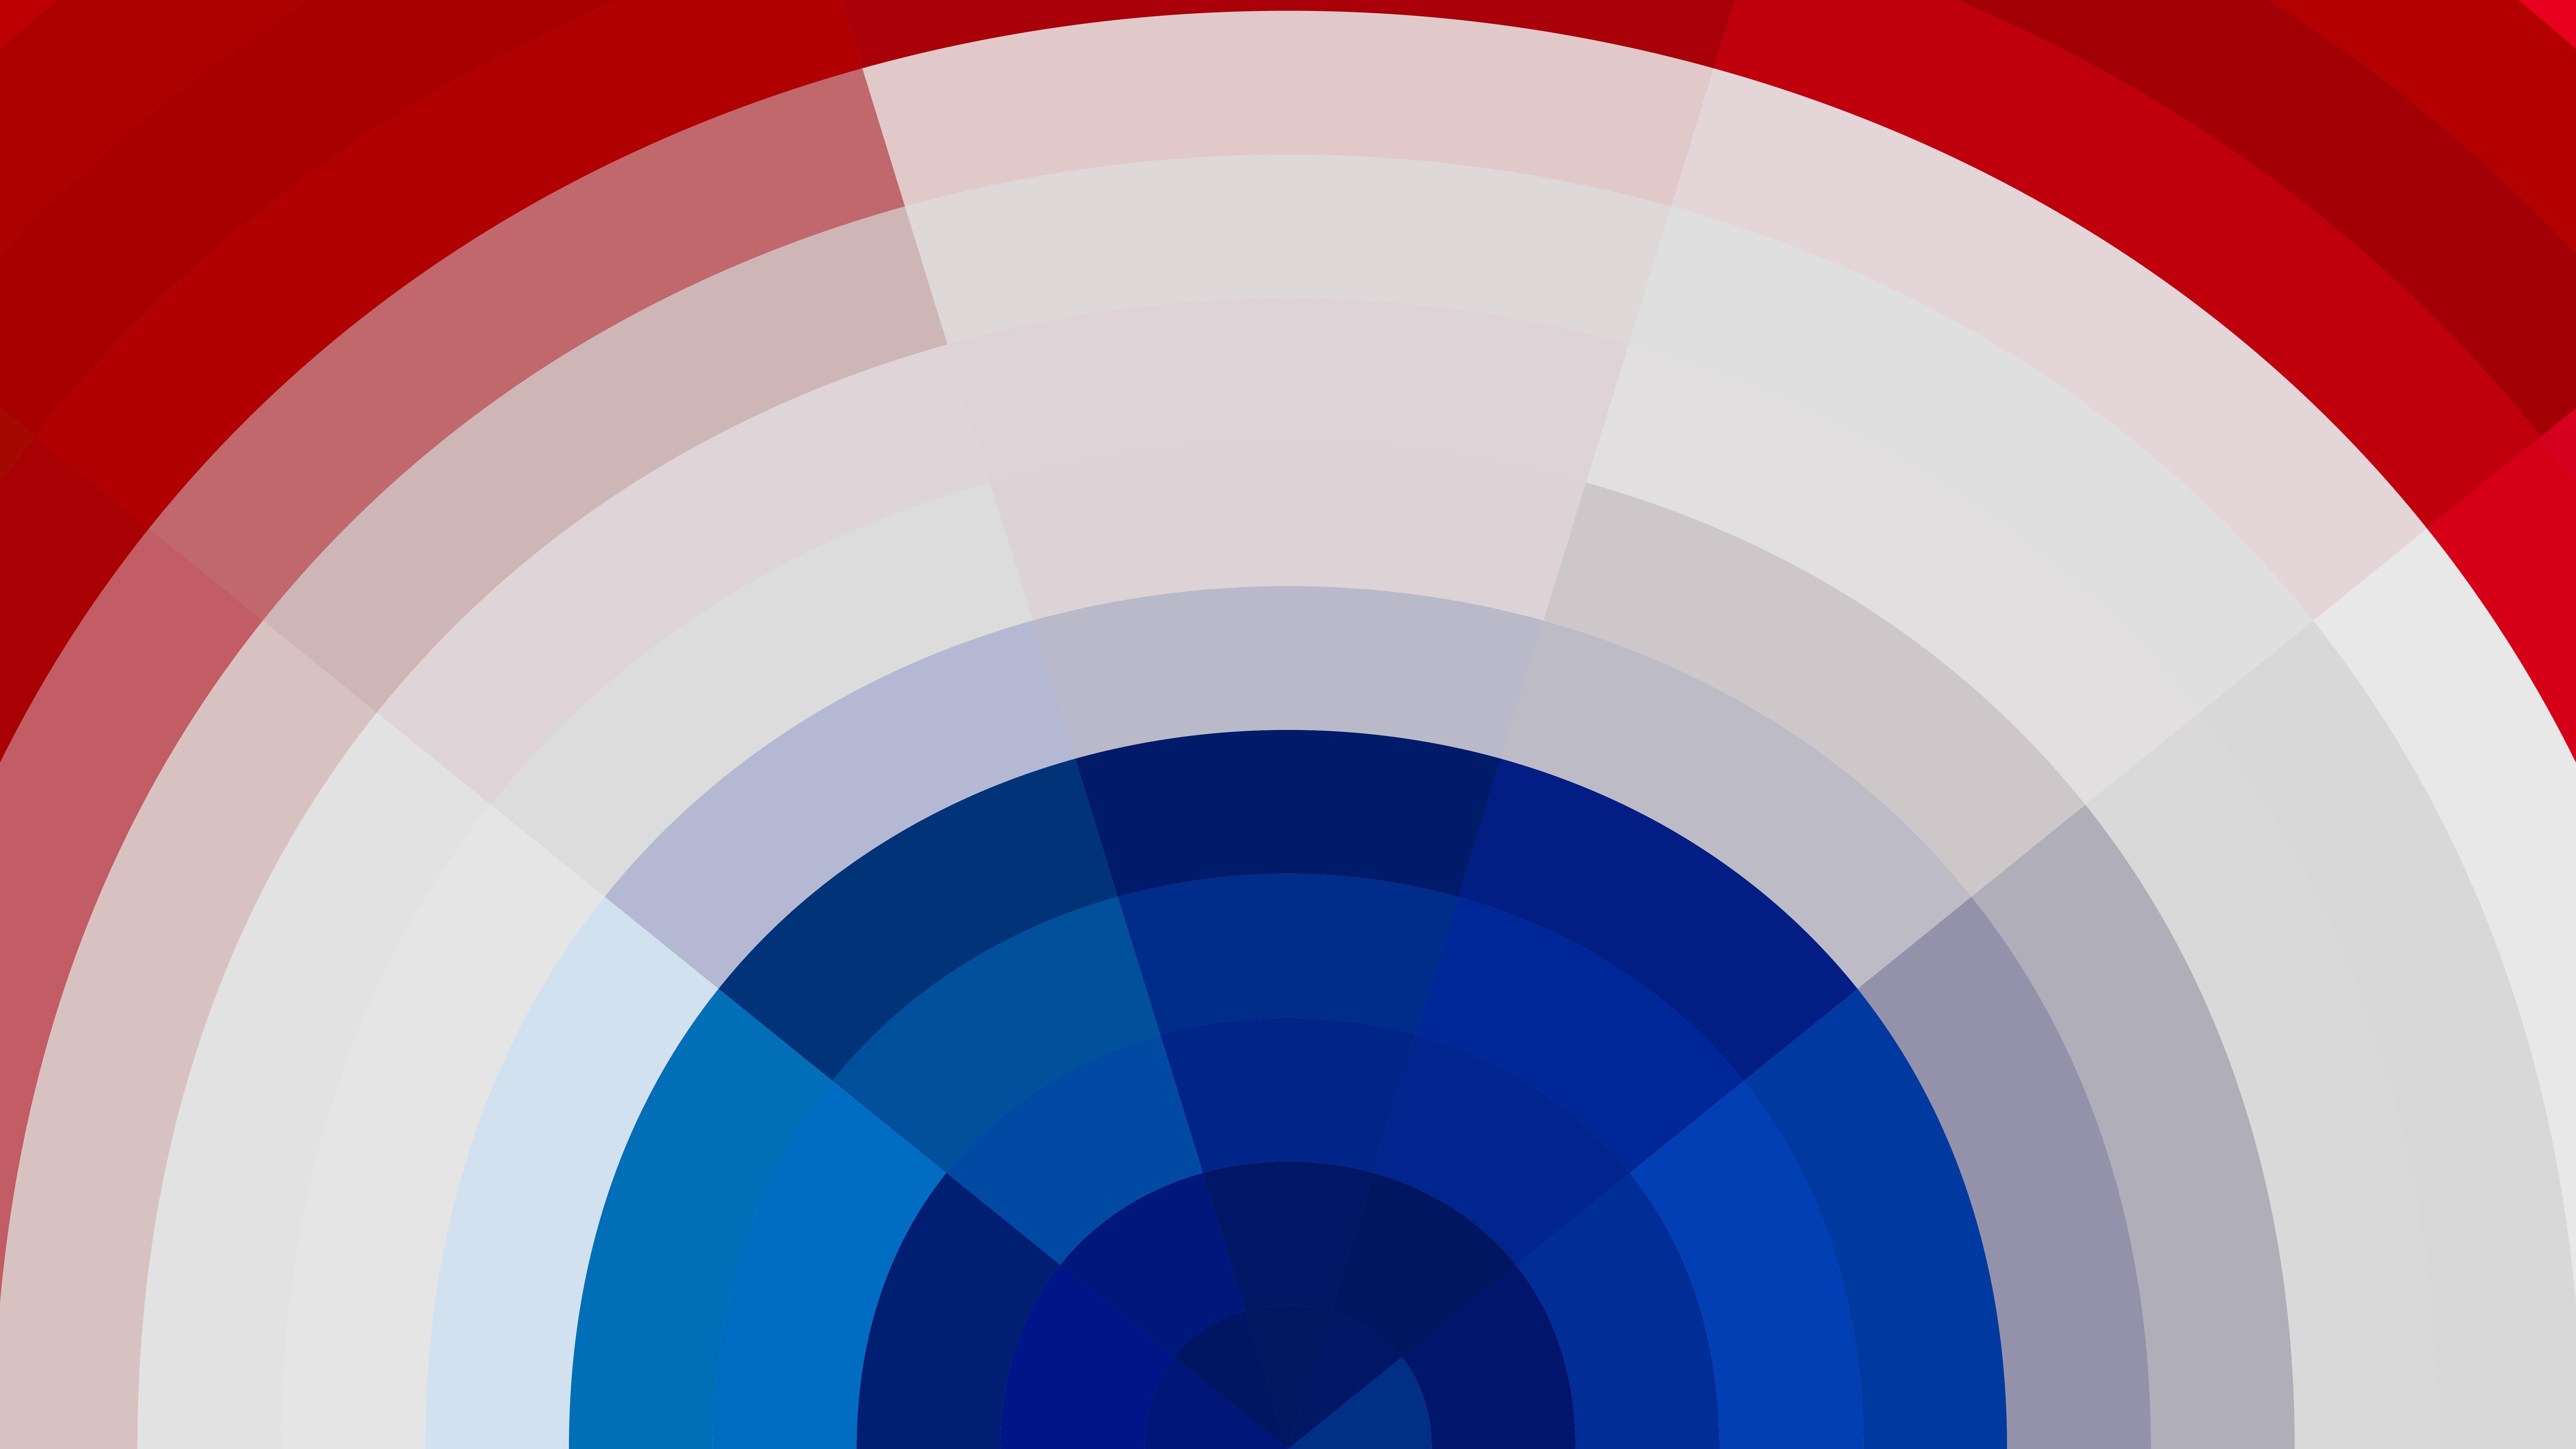 Download 1070+ Background Blue Red White HD Gratis